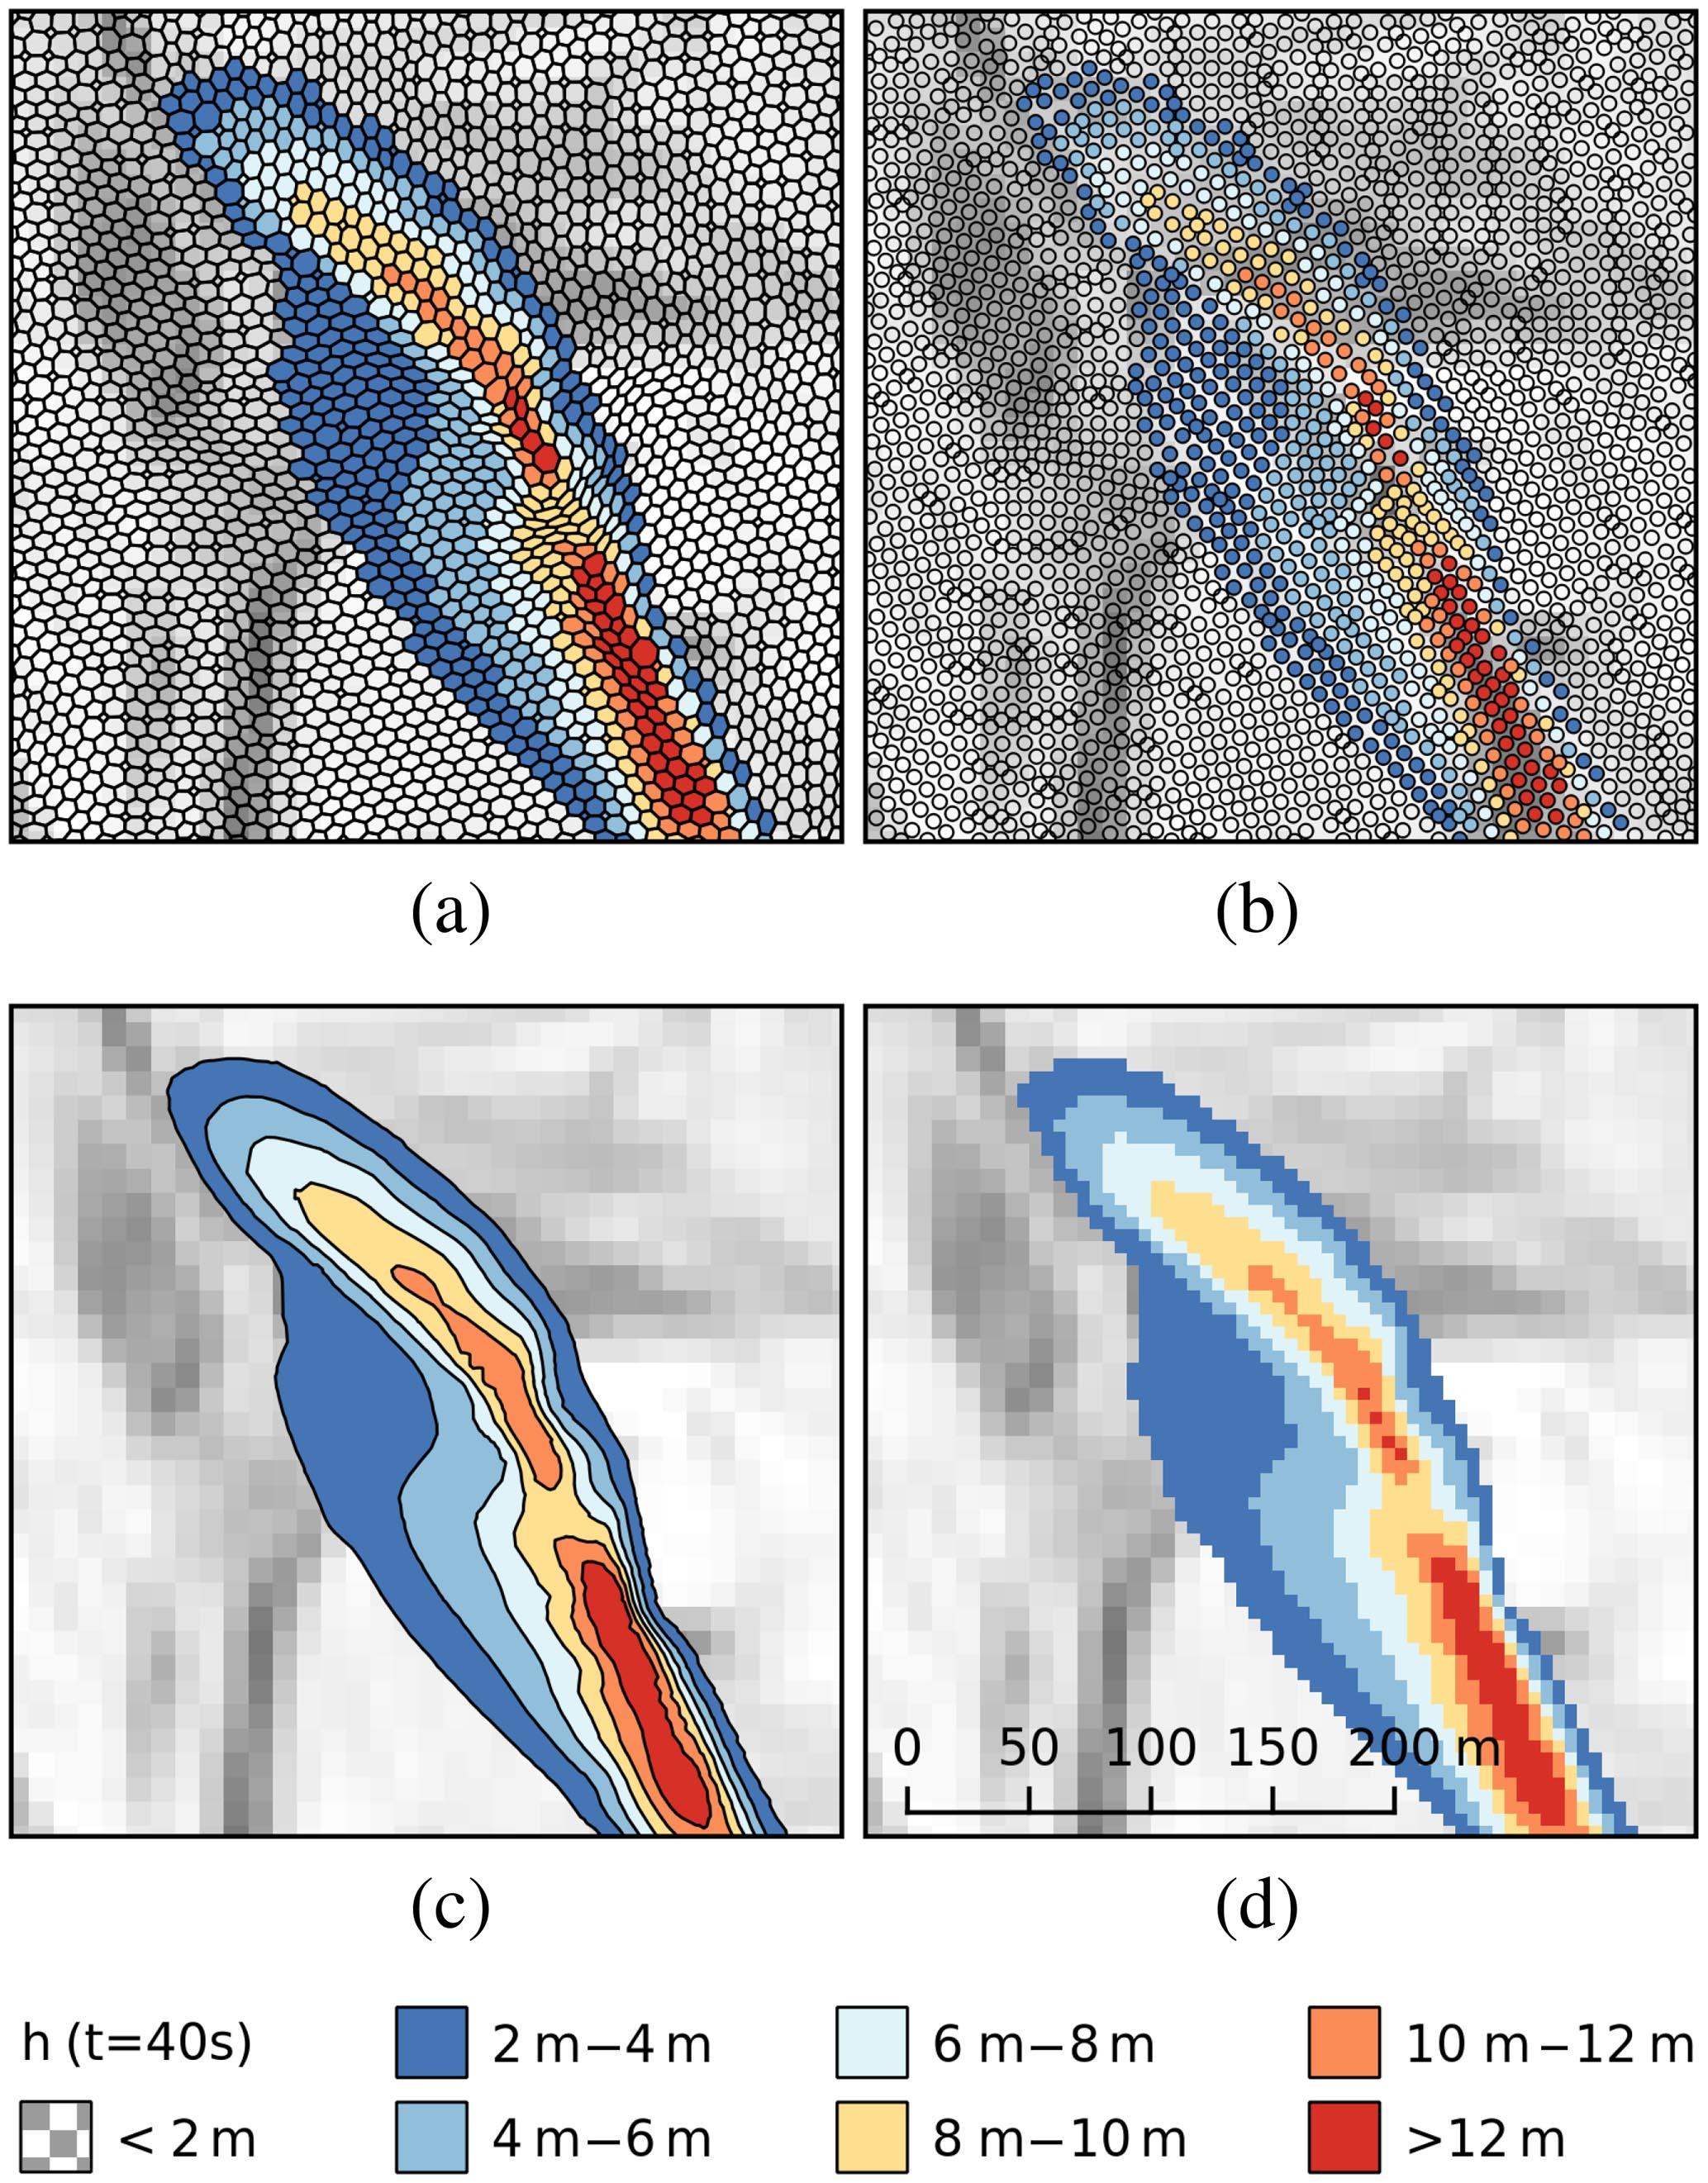 GMD - faSavageHutterFOAM 1 0: depth-integrated simulation of